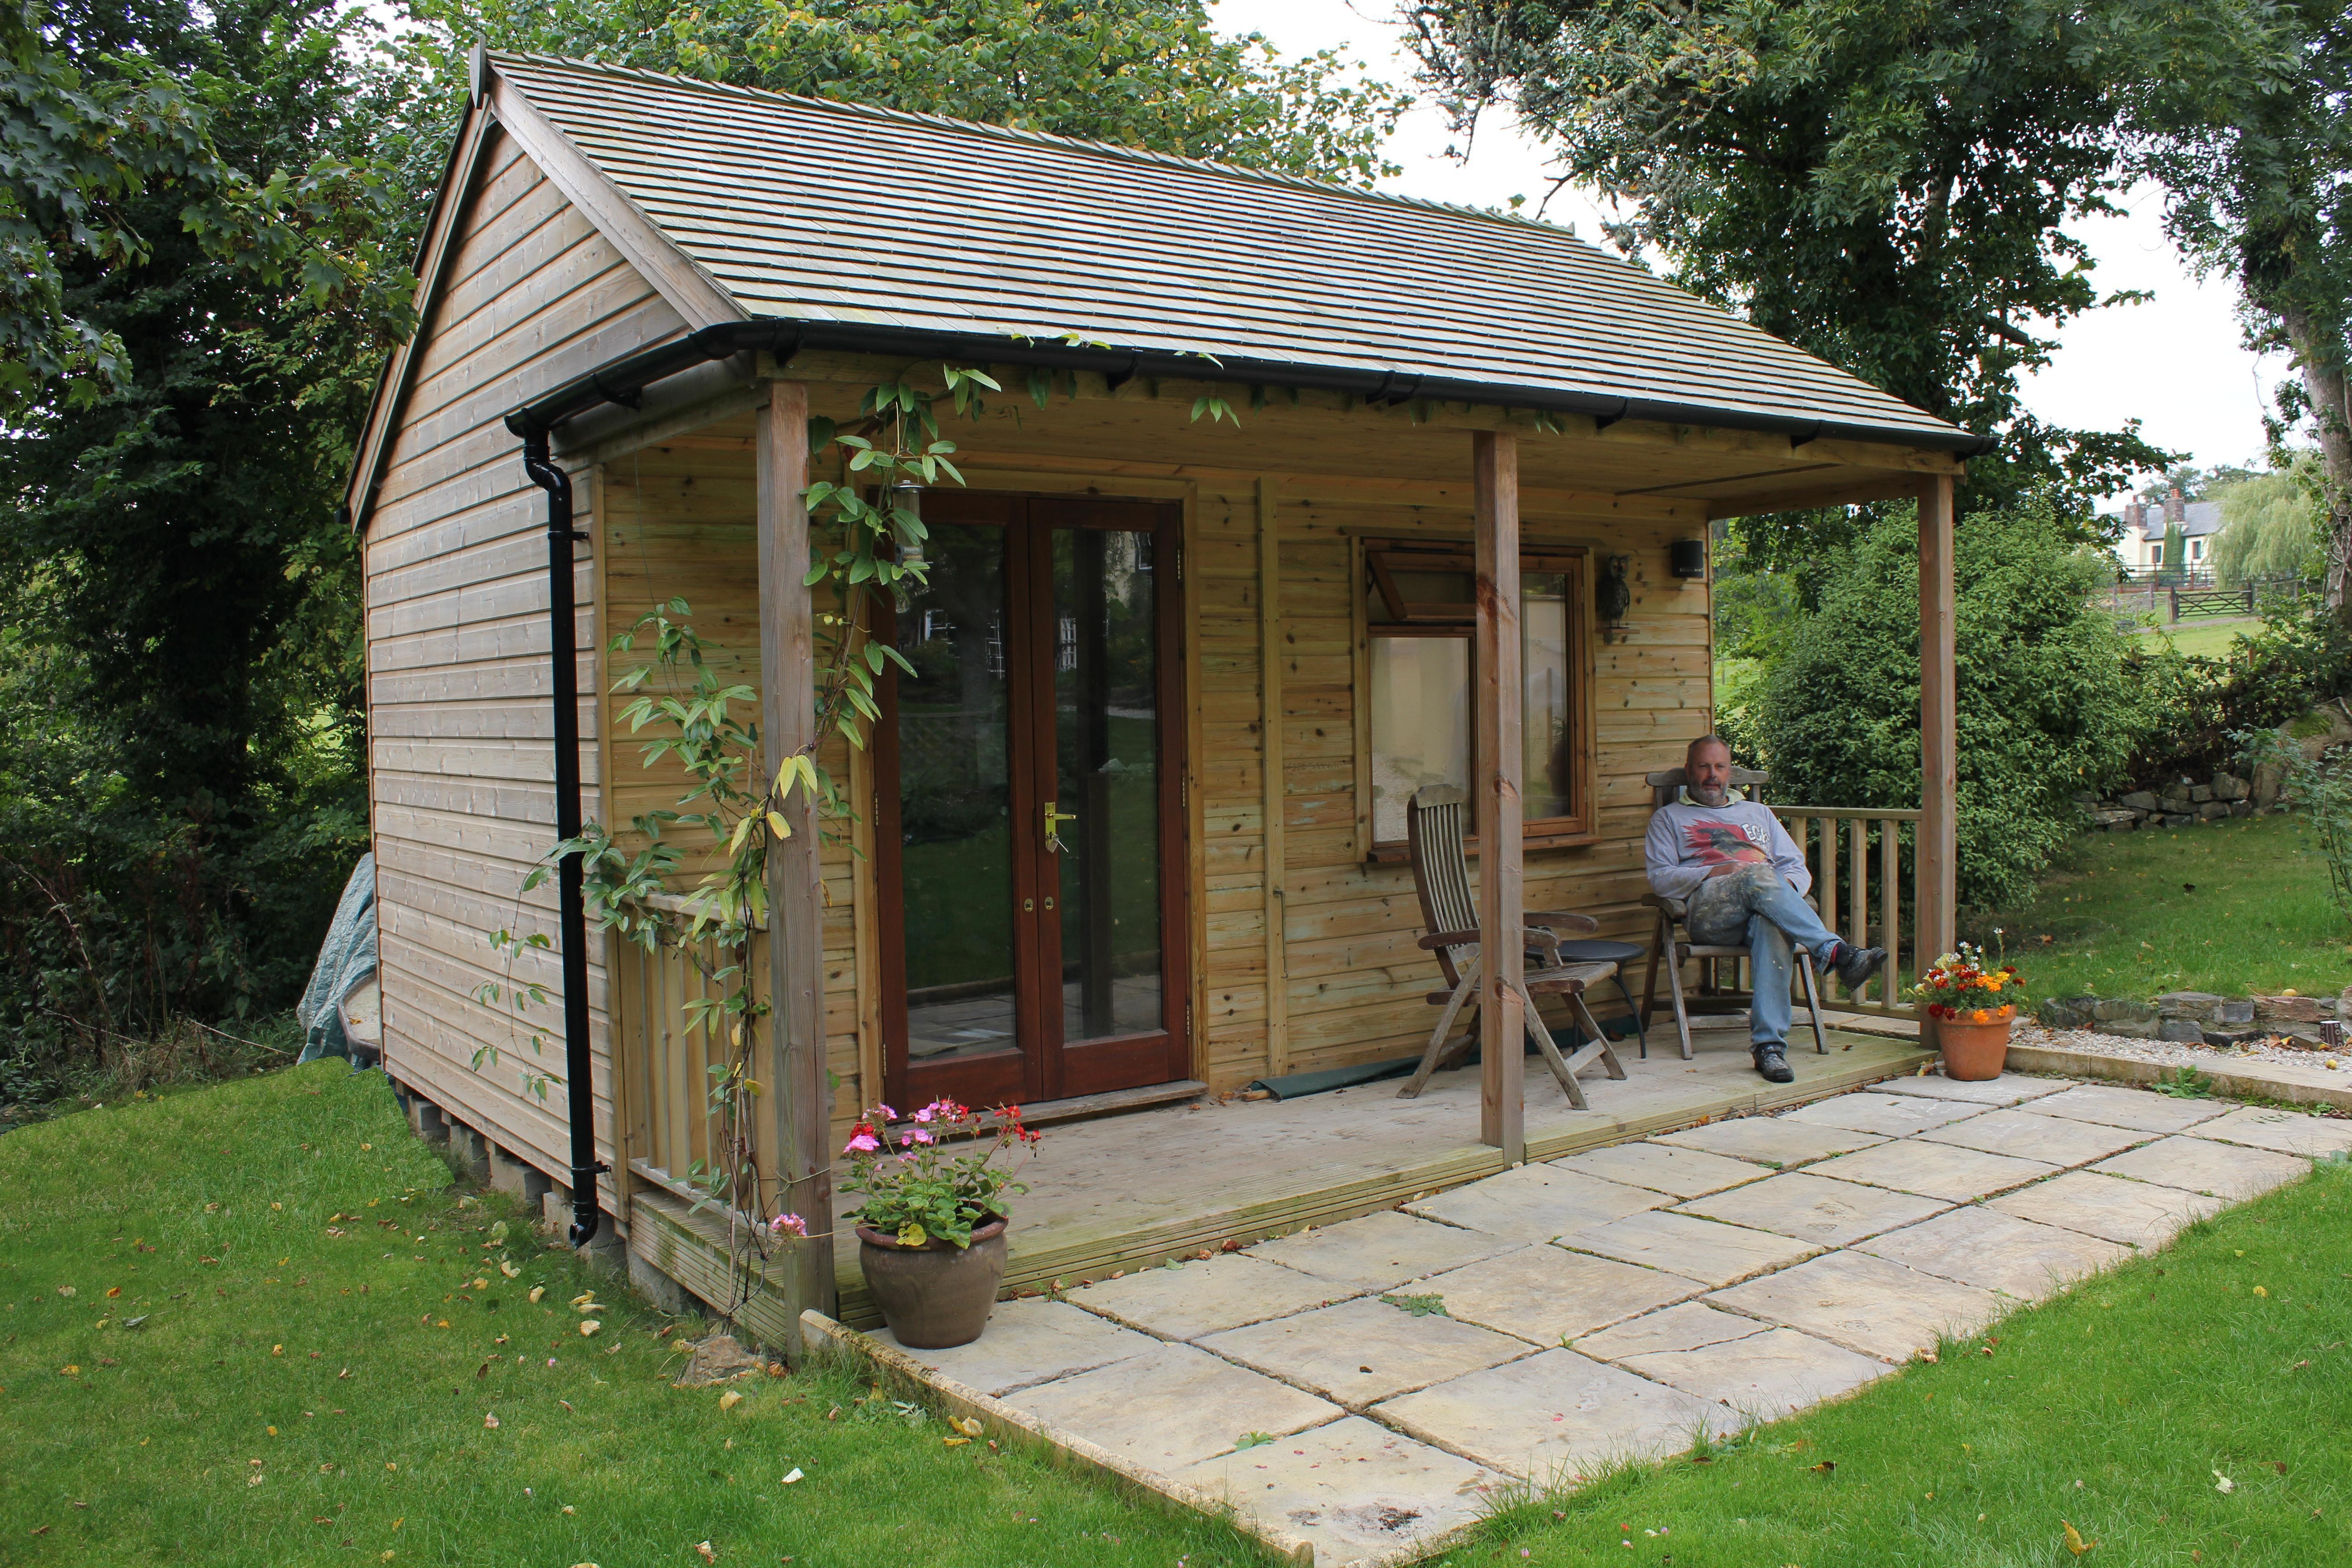 4.8m x 3m studio with cedar roof with customer